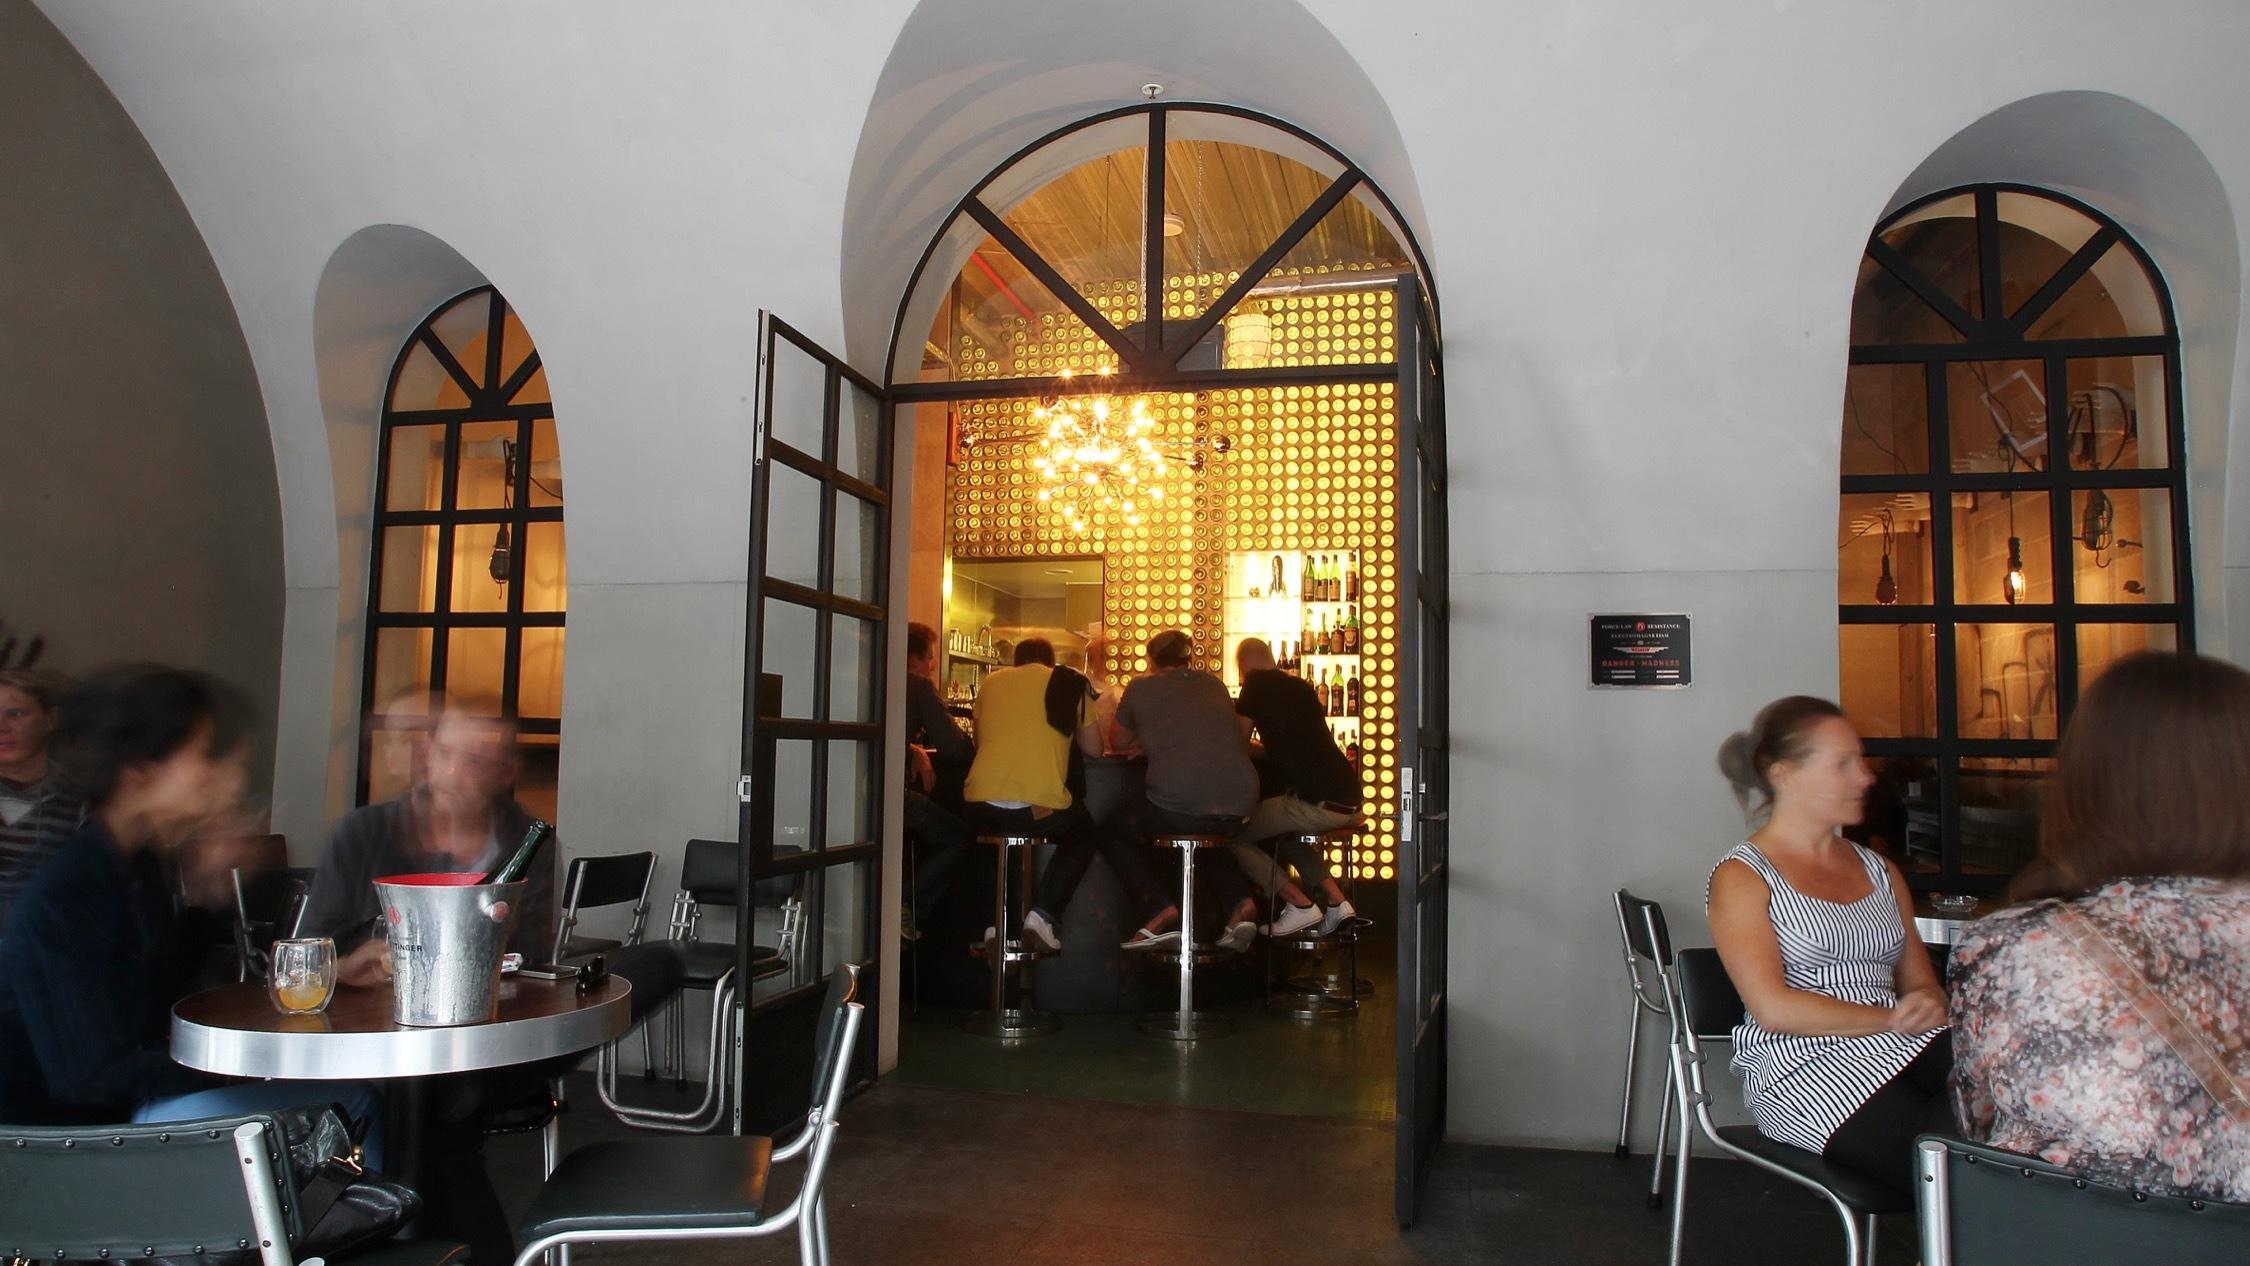 Customers drinking at Bar Ampere